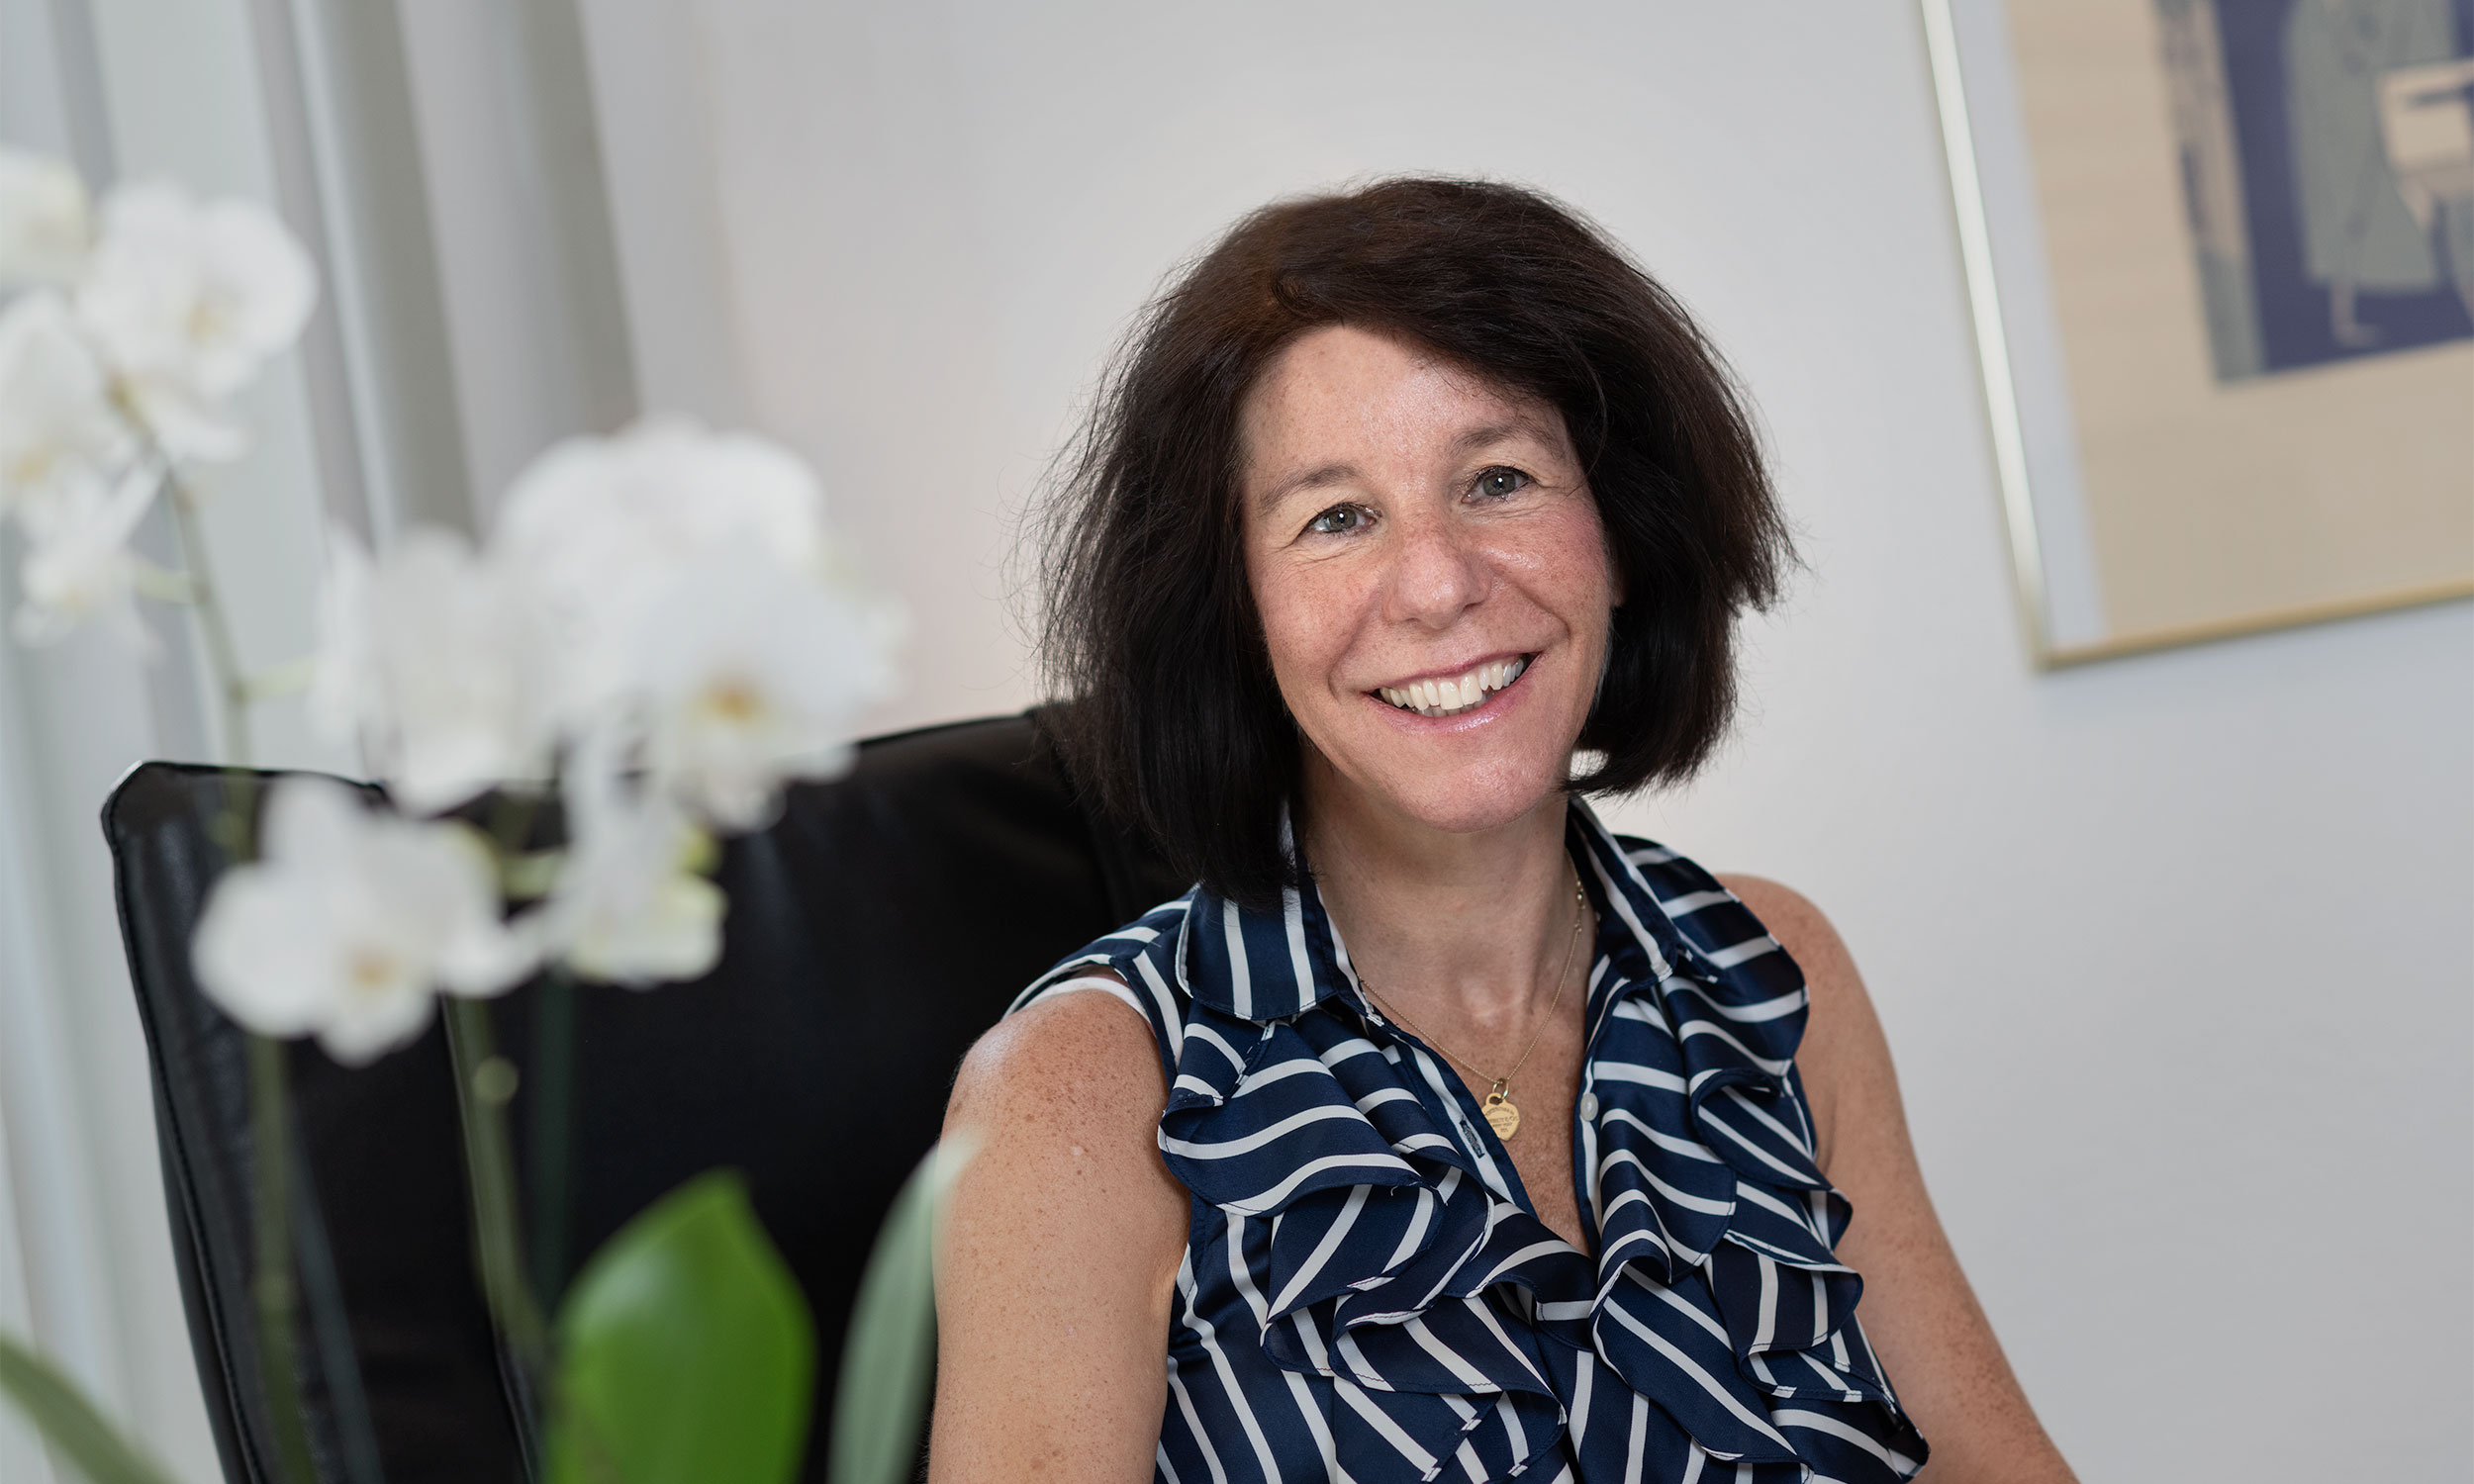 Urologie Frauen Dr. med. Maria Kunze behandelt Frauen bei urologischen Problemen